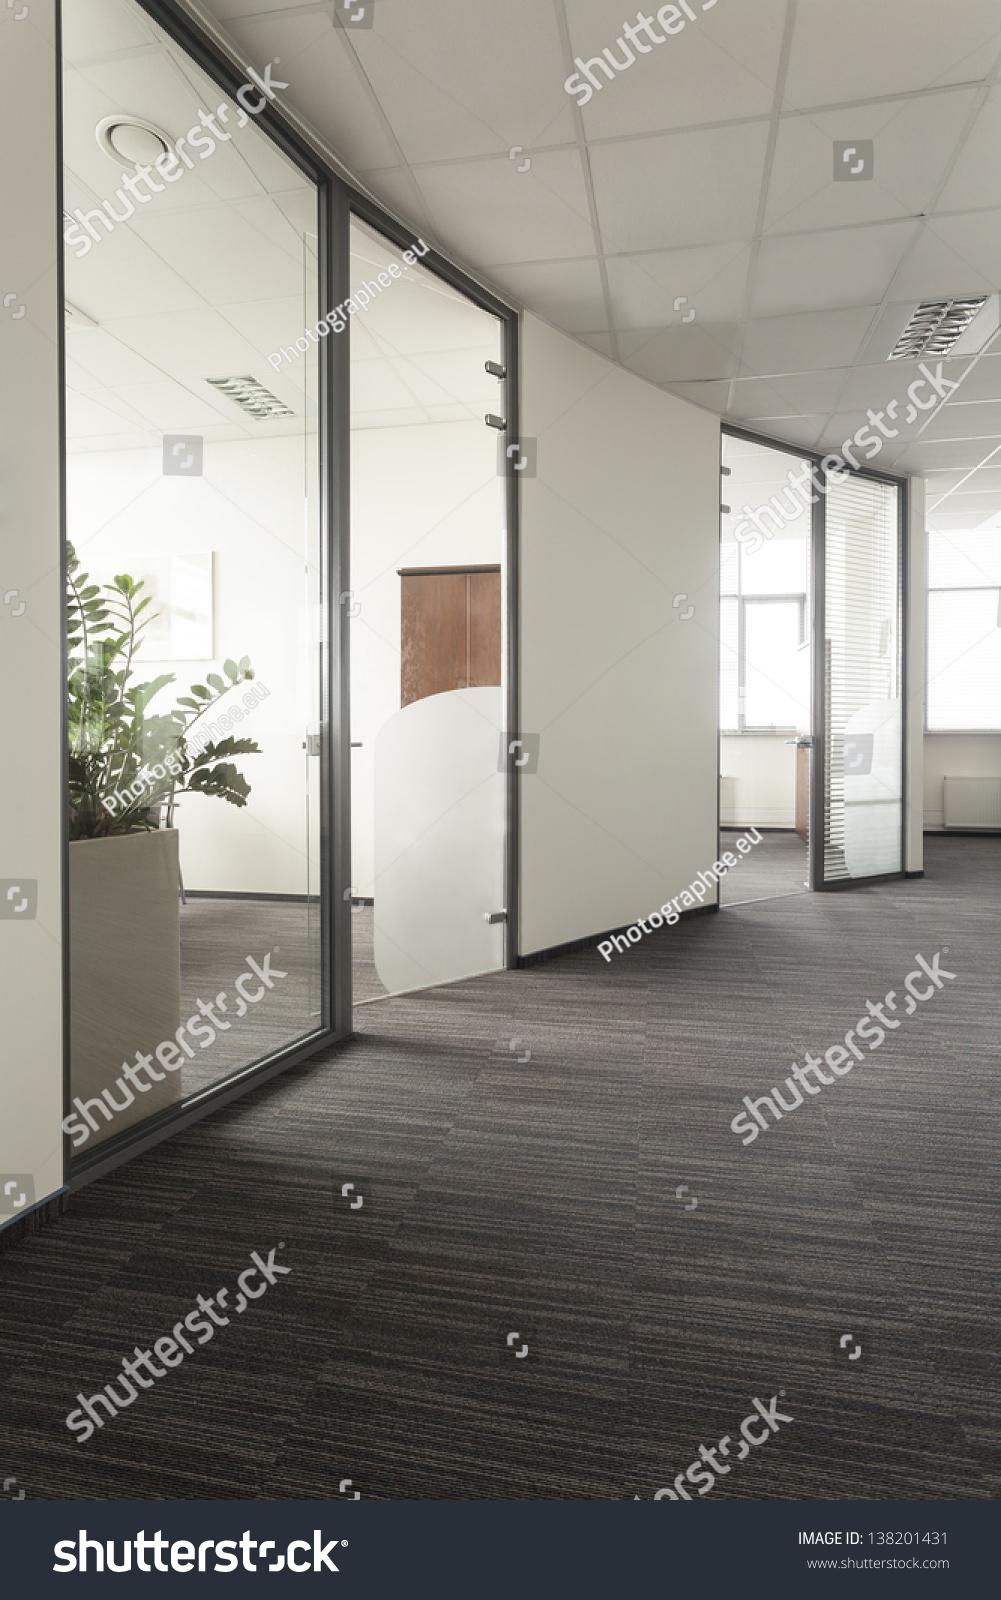 modern interior office. Modern Interior Office Stock. Of An Office, Glass Door Stock T